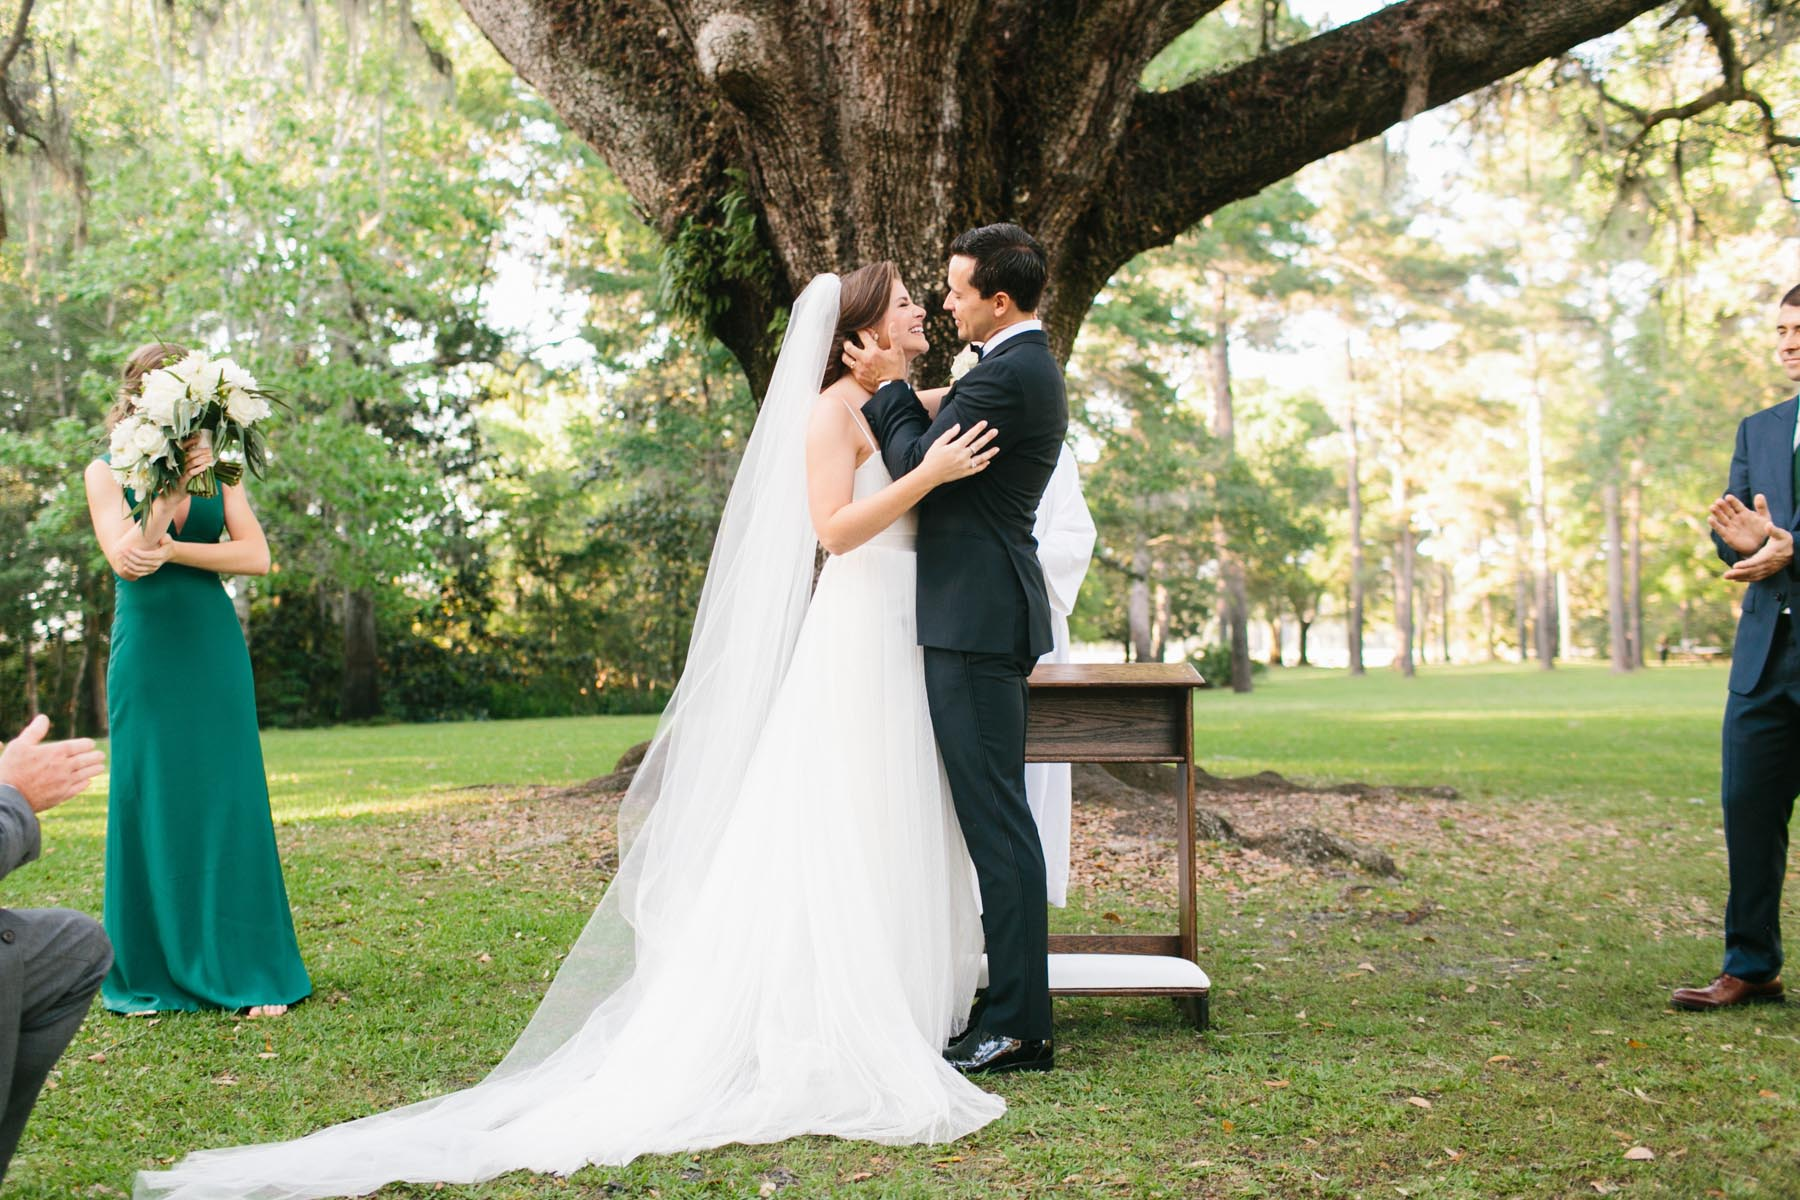 lowry wedding blog eden garden florida wedding-74